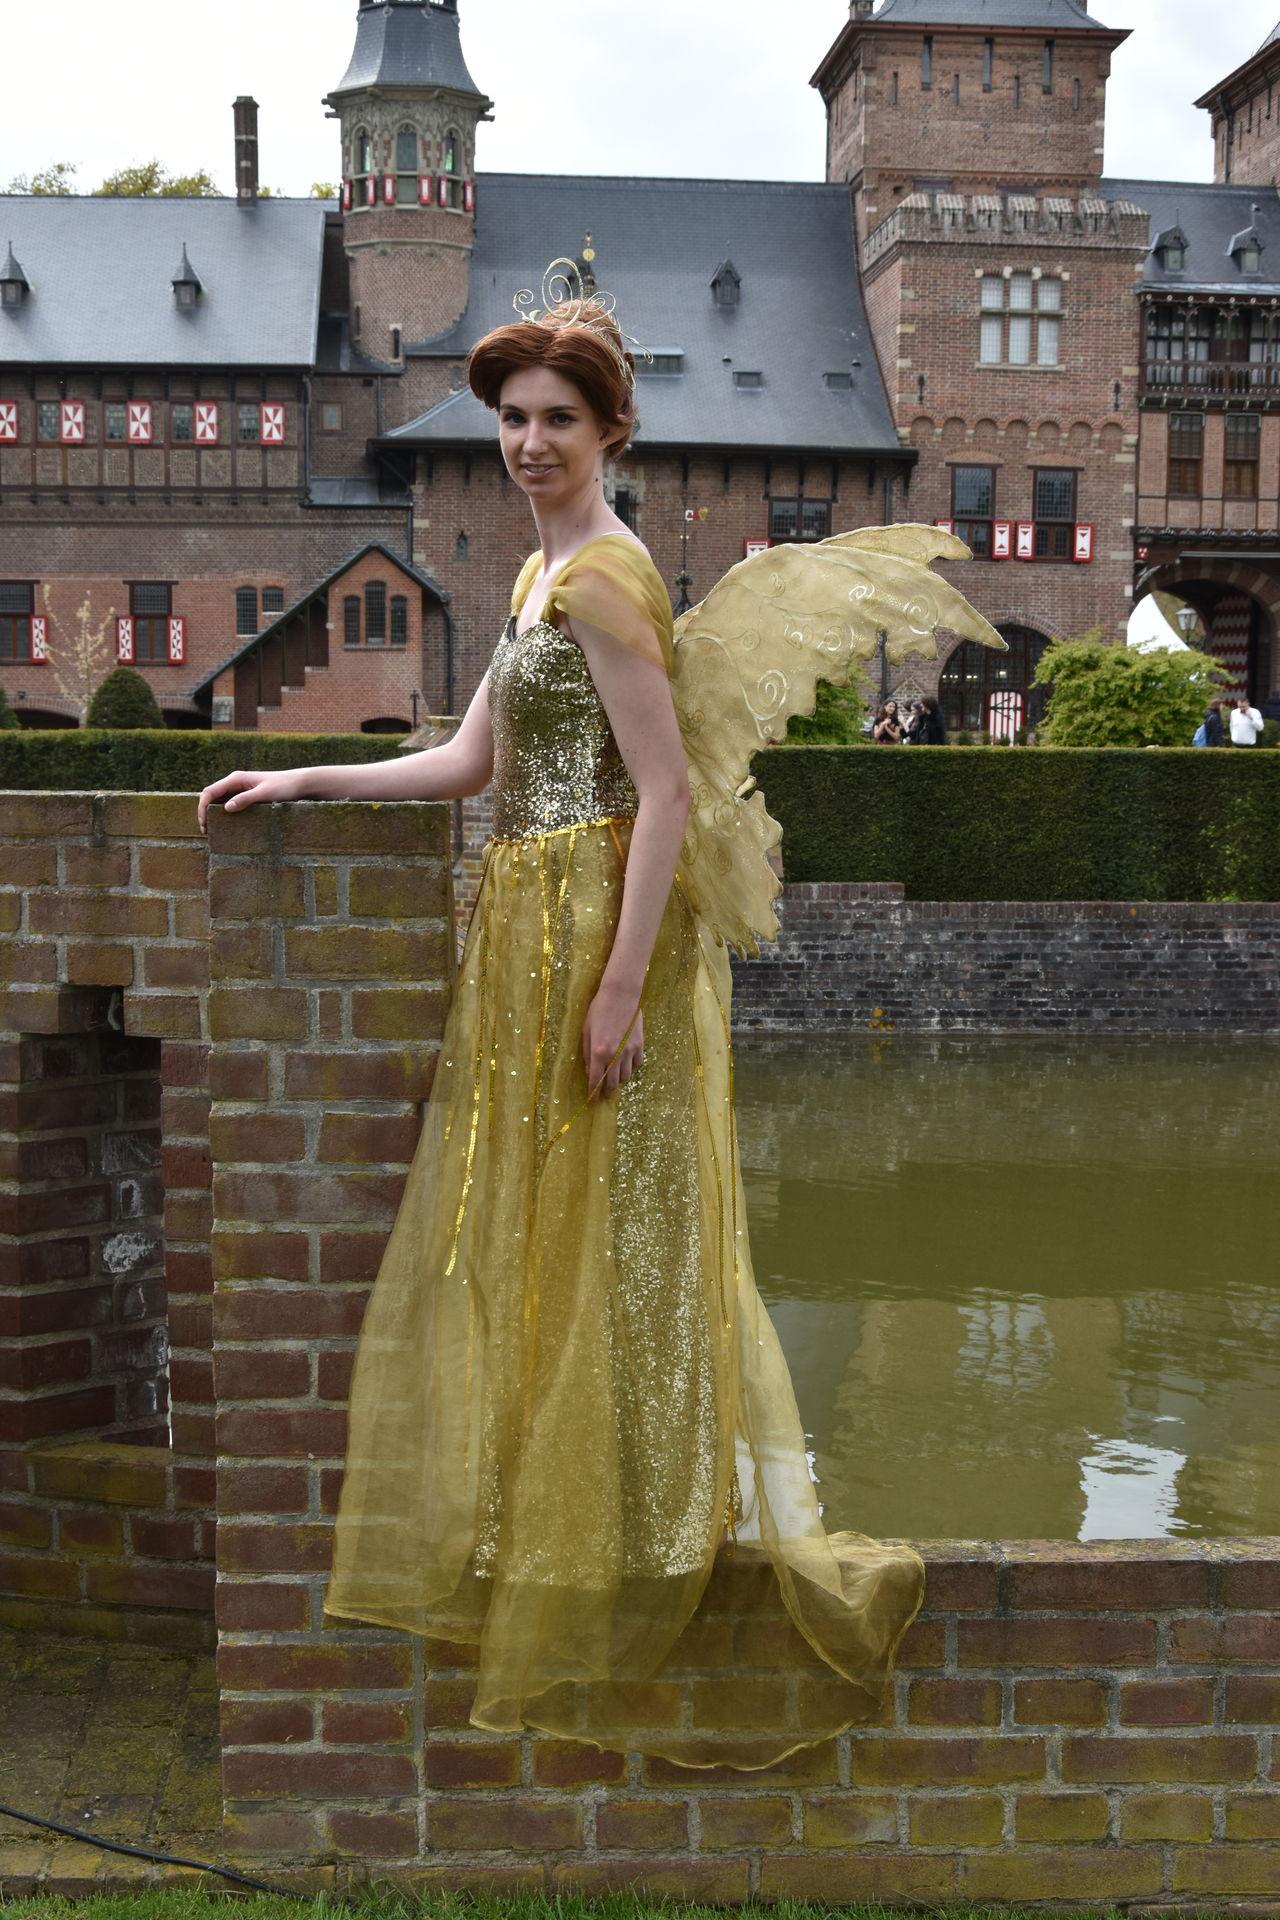 Architecture Beautiful Woman Building Exterior Castle Grounds Dress Elfia Fairy Fashion Lifestyles One Person Portrait Standing